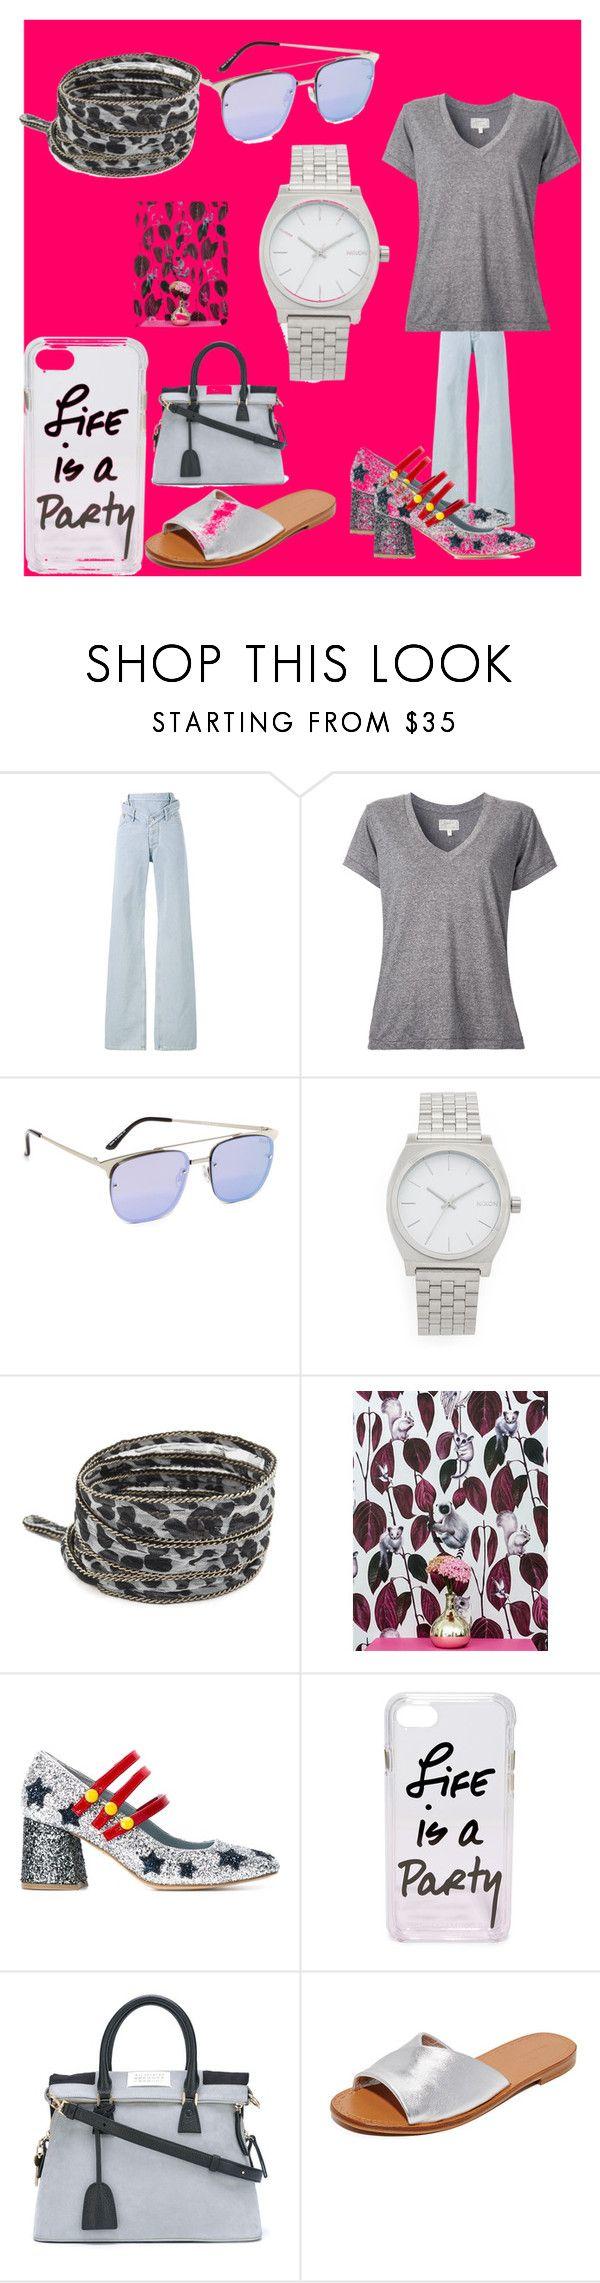 """best fashion sale"" by denisee-denisee ❤ liked on Polyvore featuring Y/Project, Current/Elliott, Quay, Nixon, Chan Luu, Witch & Watchman, Chiara Ferragni, Rebecca Minkoff, Maison Margiela and Diane Von Furstenberg"